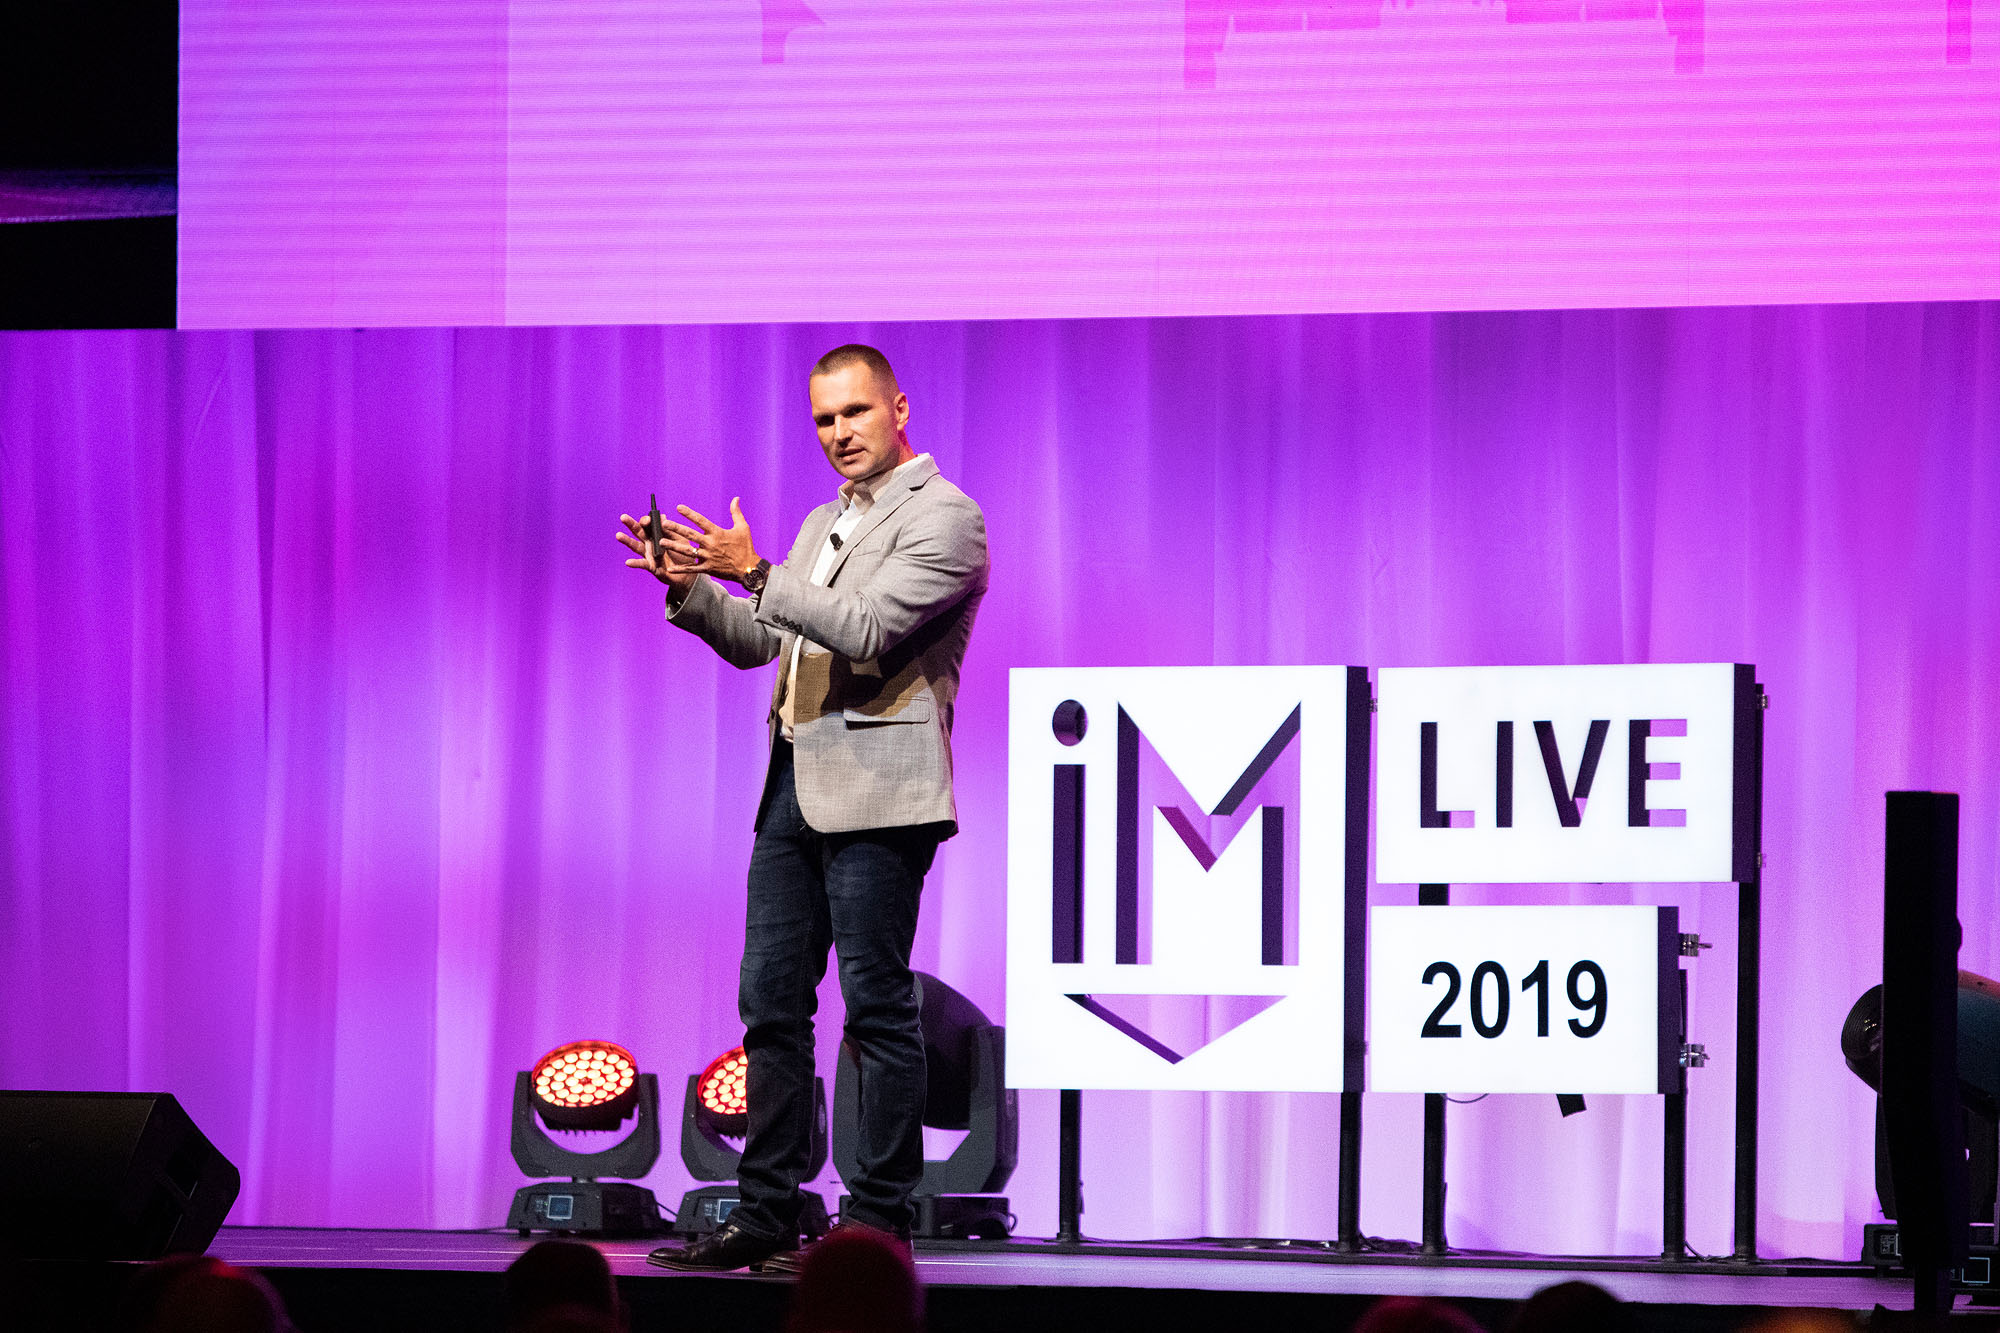 Marcus Sheridan, IMPACT Live 2019